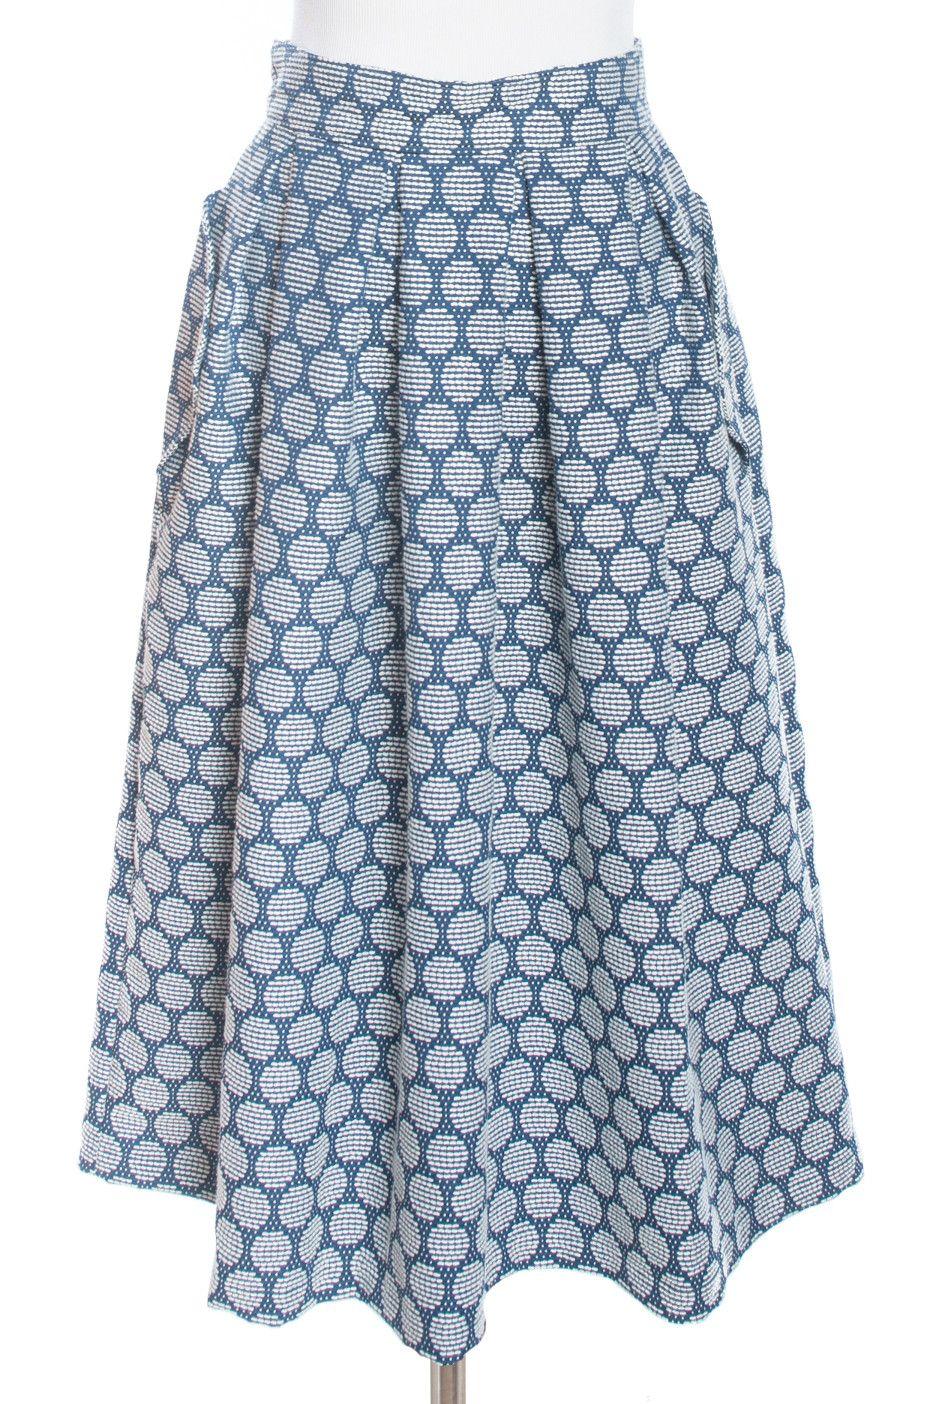 Wedgwood sewing pattern by straight stitch designs straight stitch